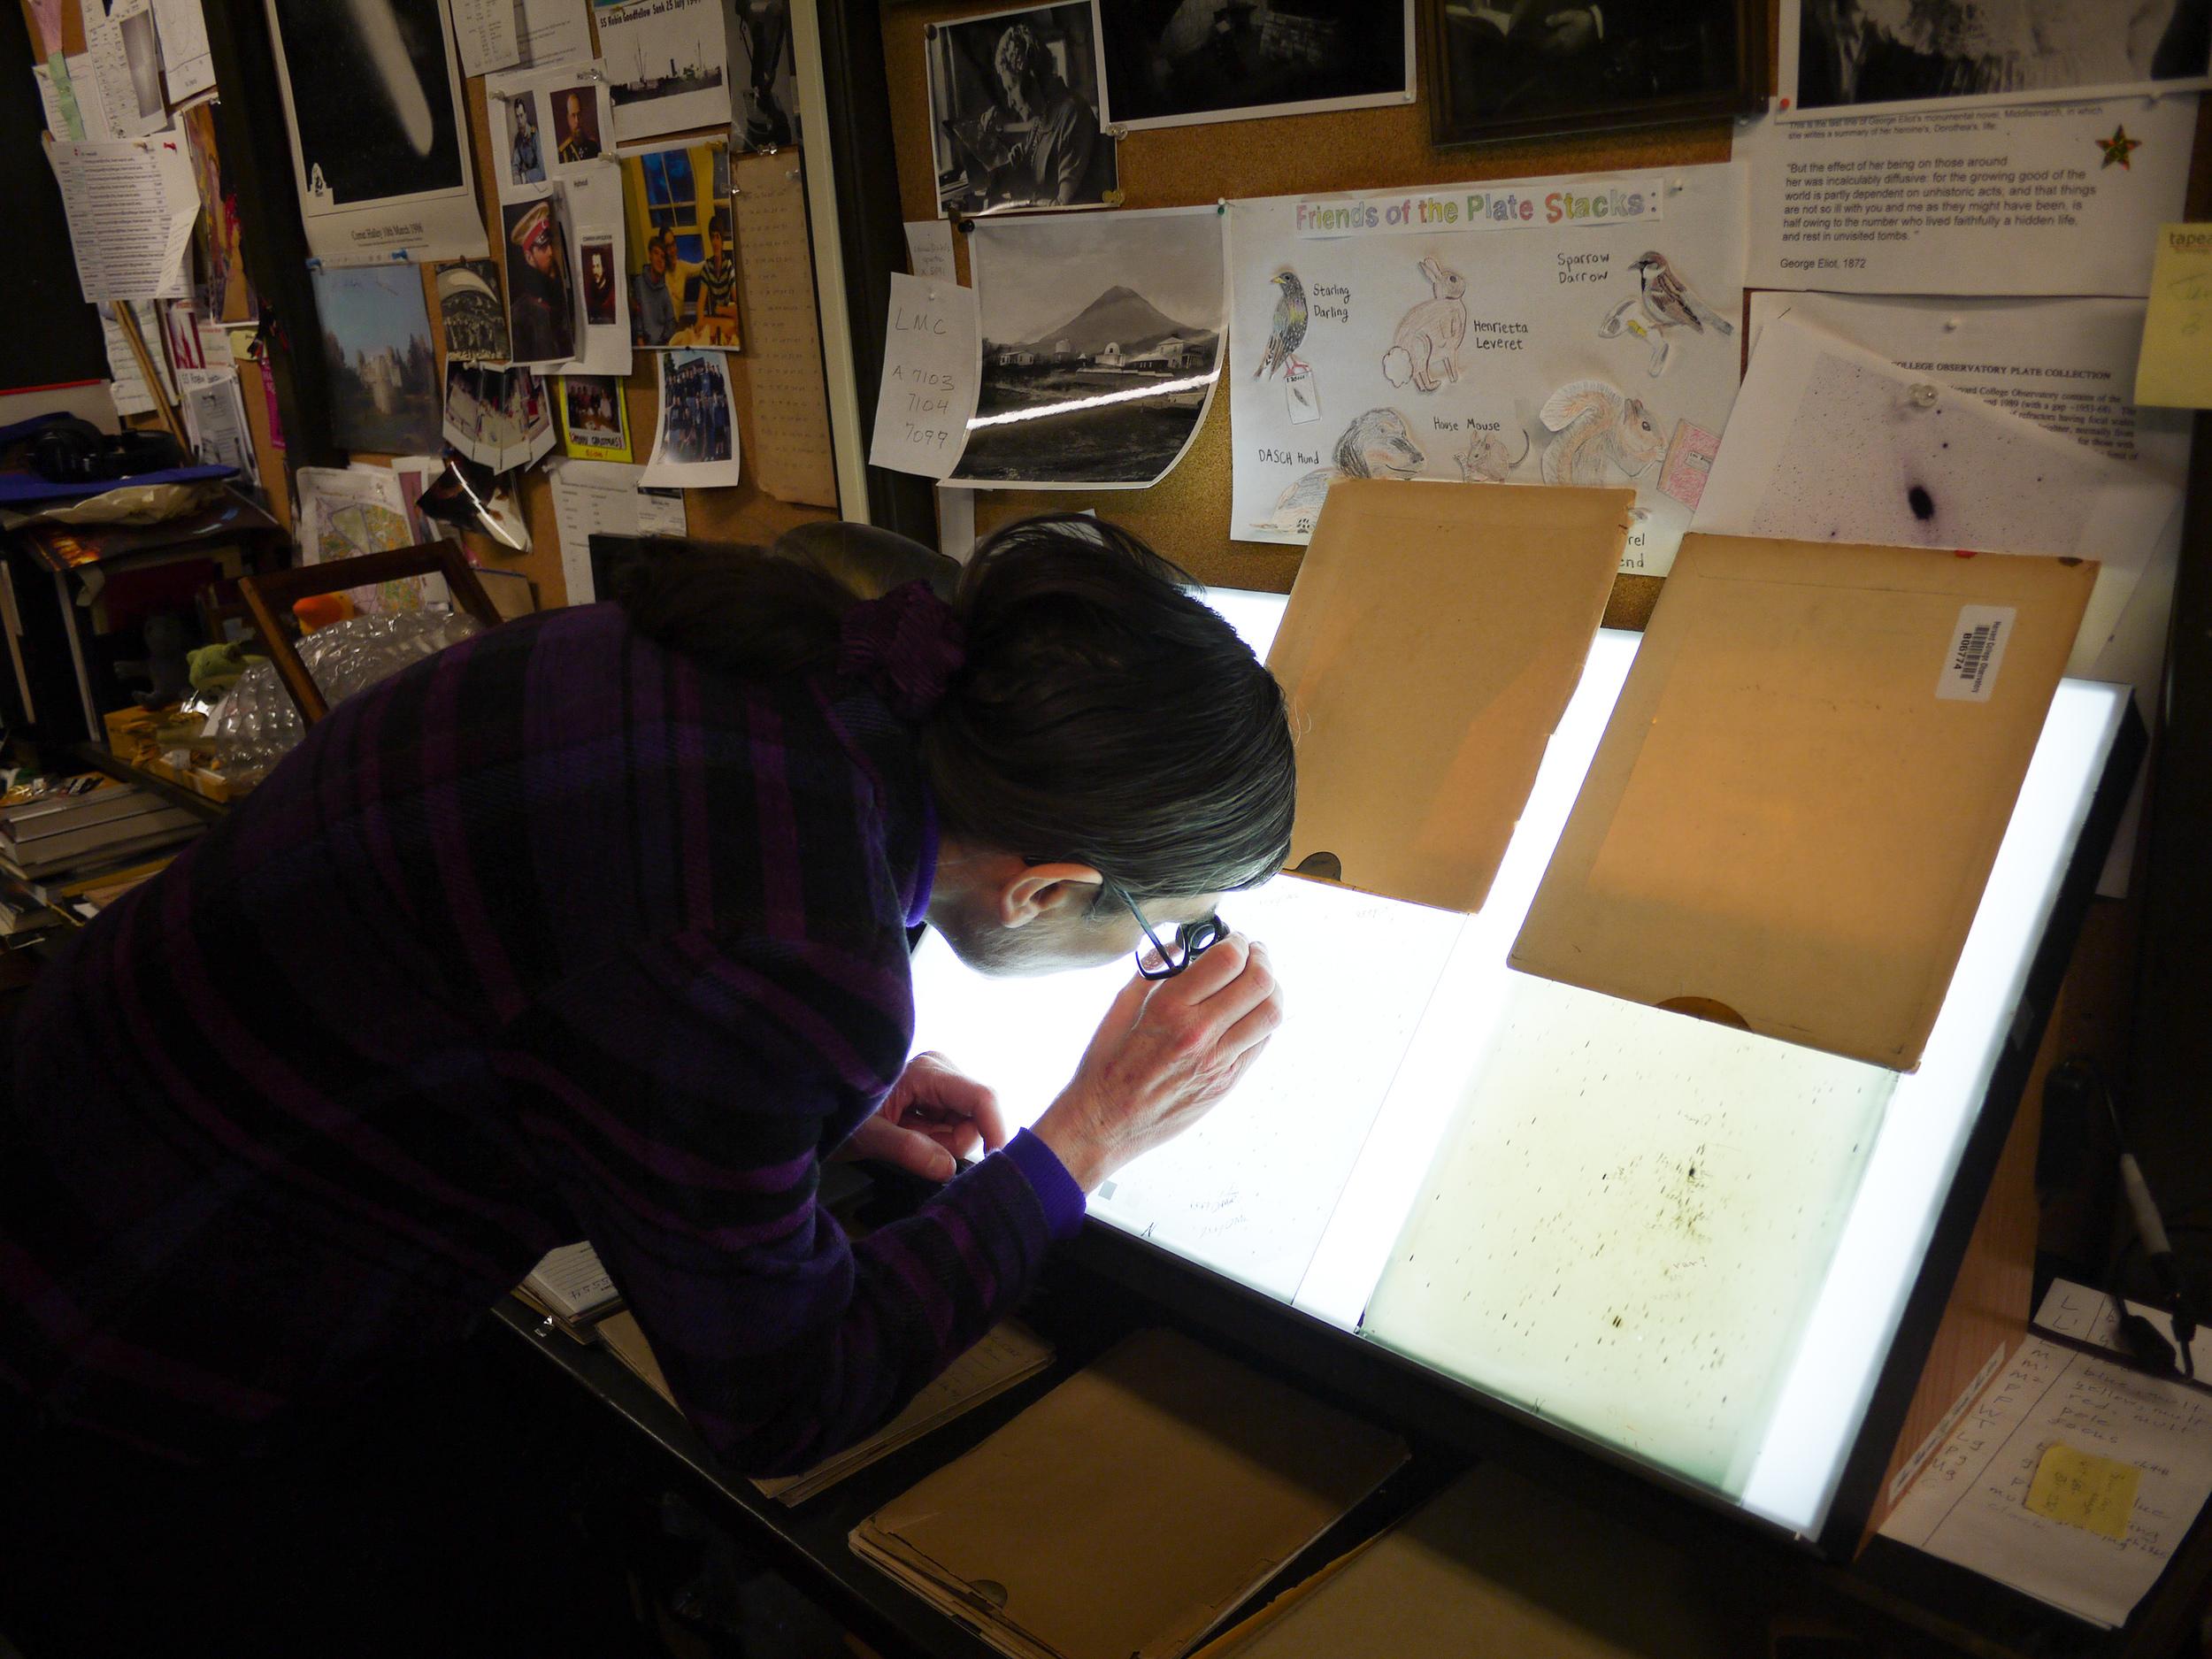 Alison Doane, Curator of Astronomical Photographs